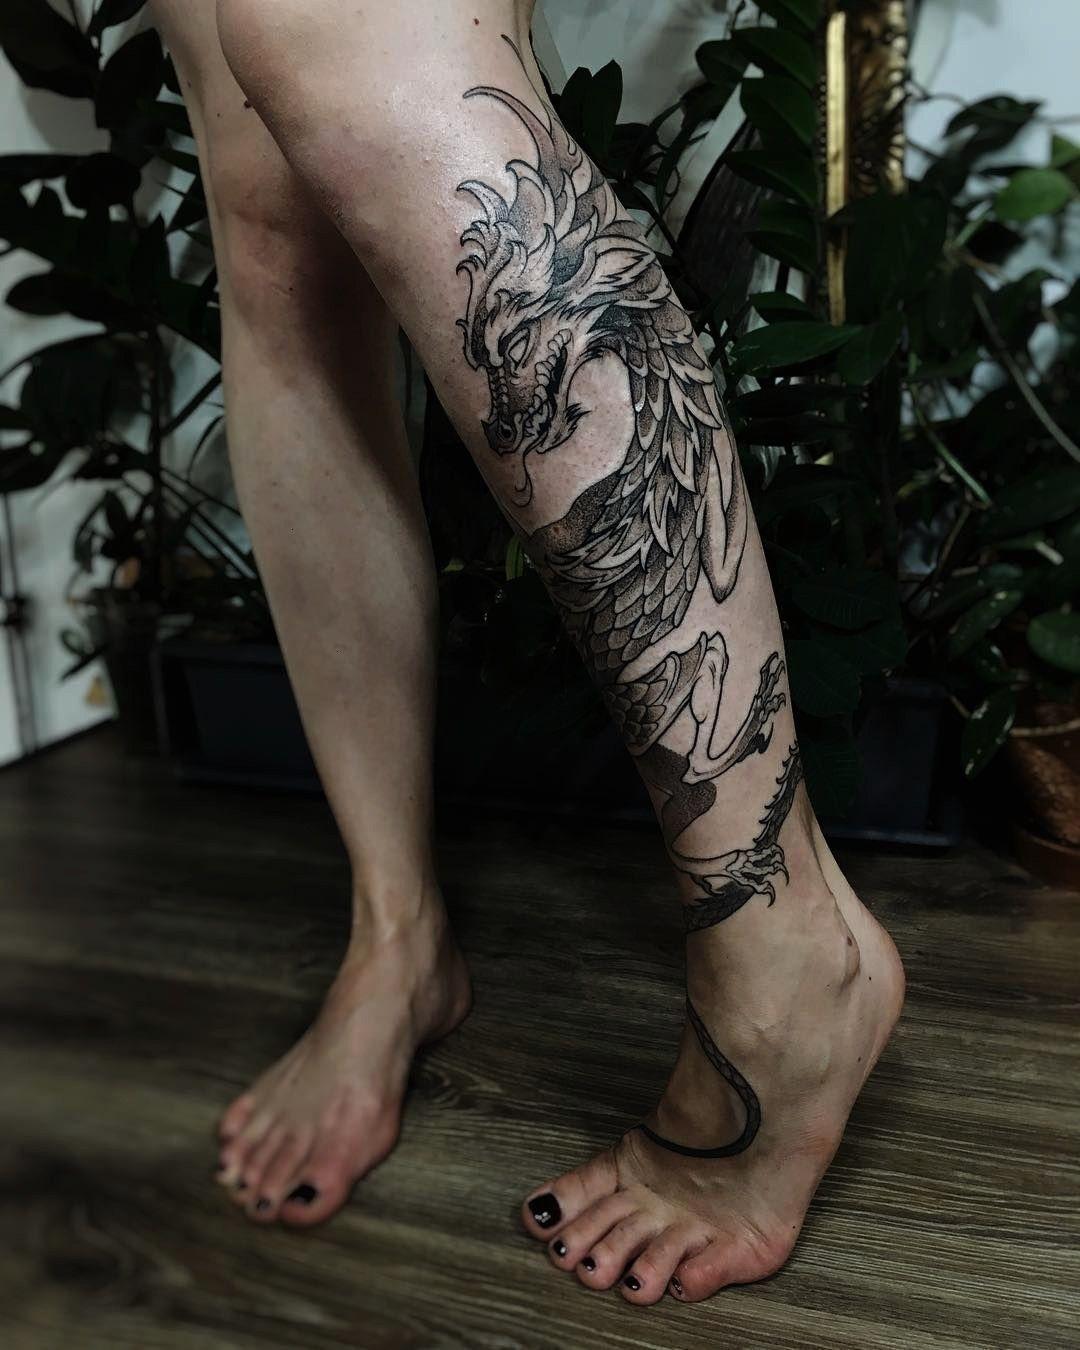 Dragon Tattoo Wrapped Around The Wrist By Jakedoestattoos Royalfleshtattoo Around Arm Tattoo Flesh Tattoo Wrap Around Wrist Tattoos